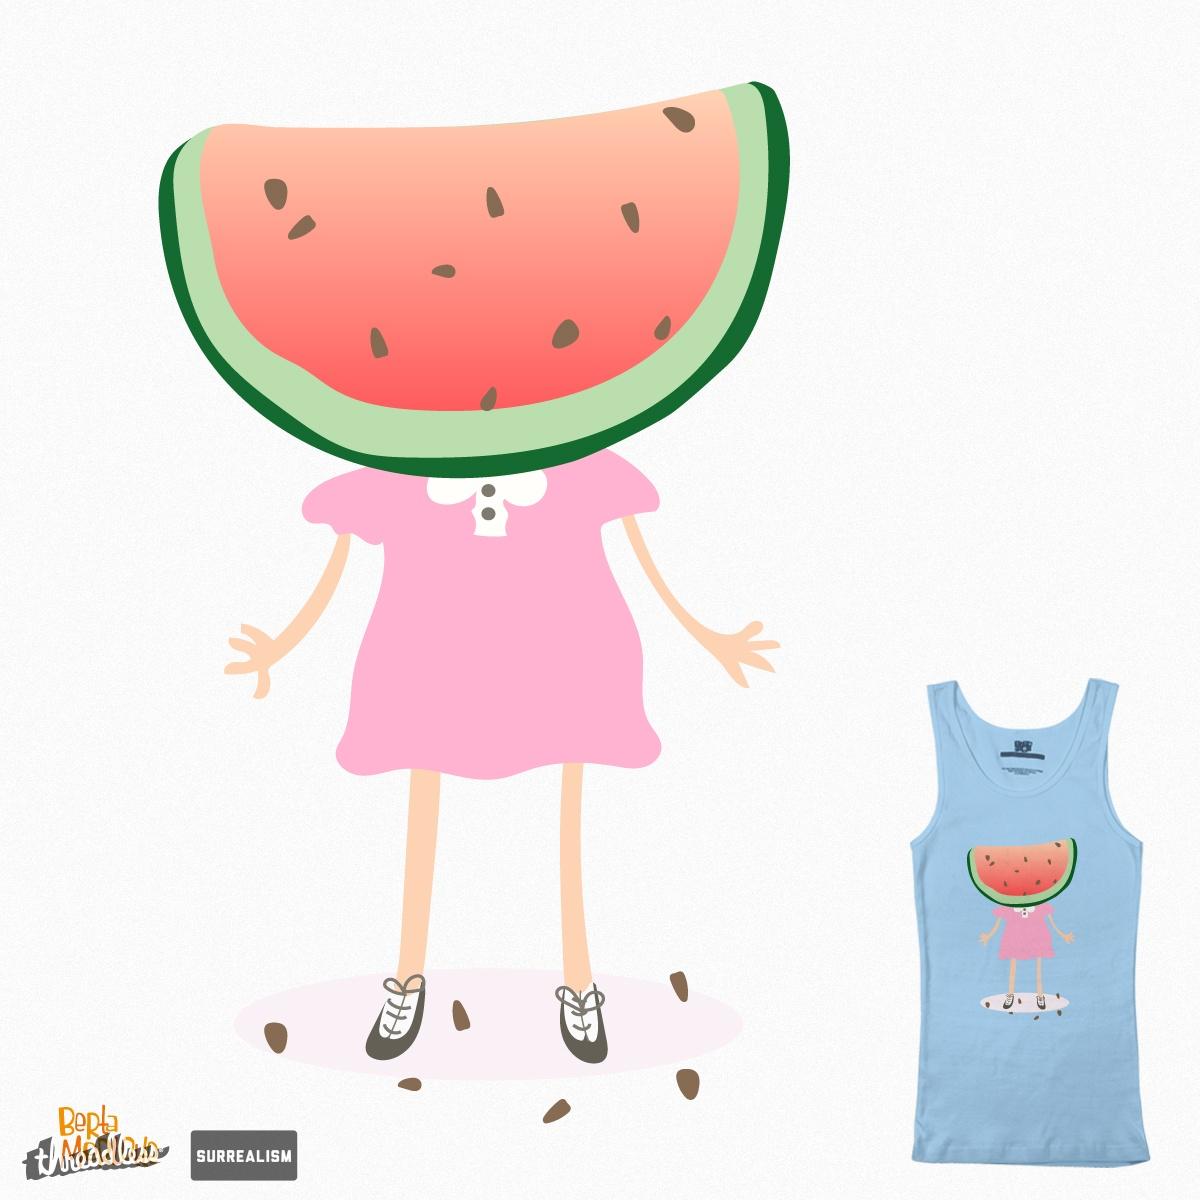 Sandy Watermelon by BertaMerlotte on Threadless